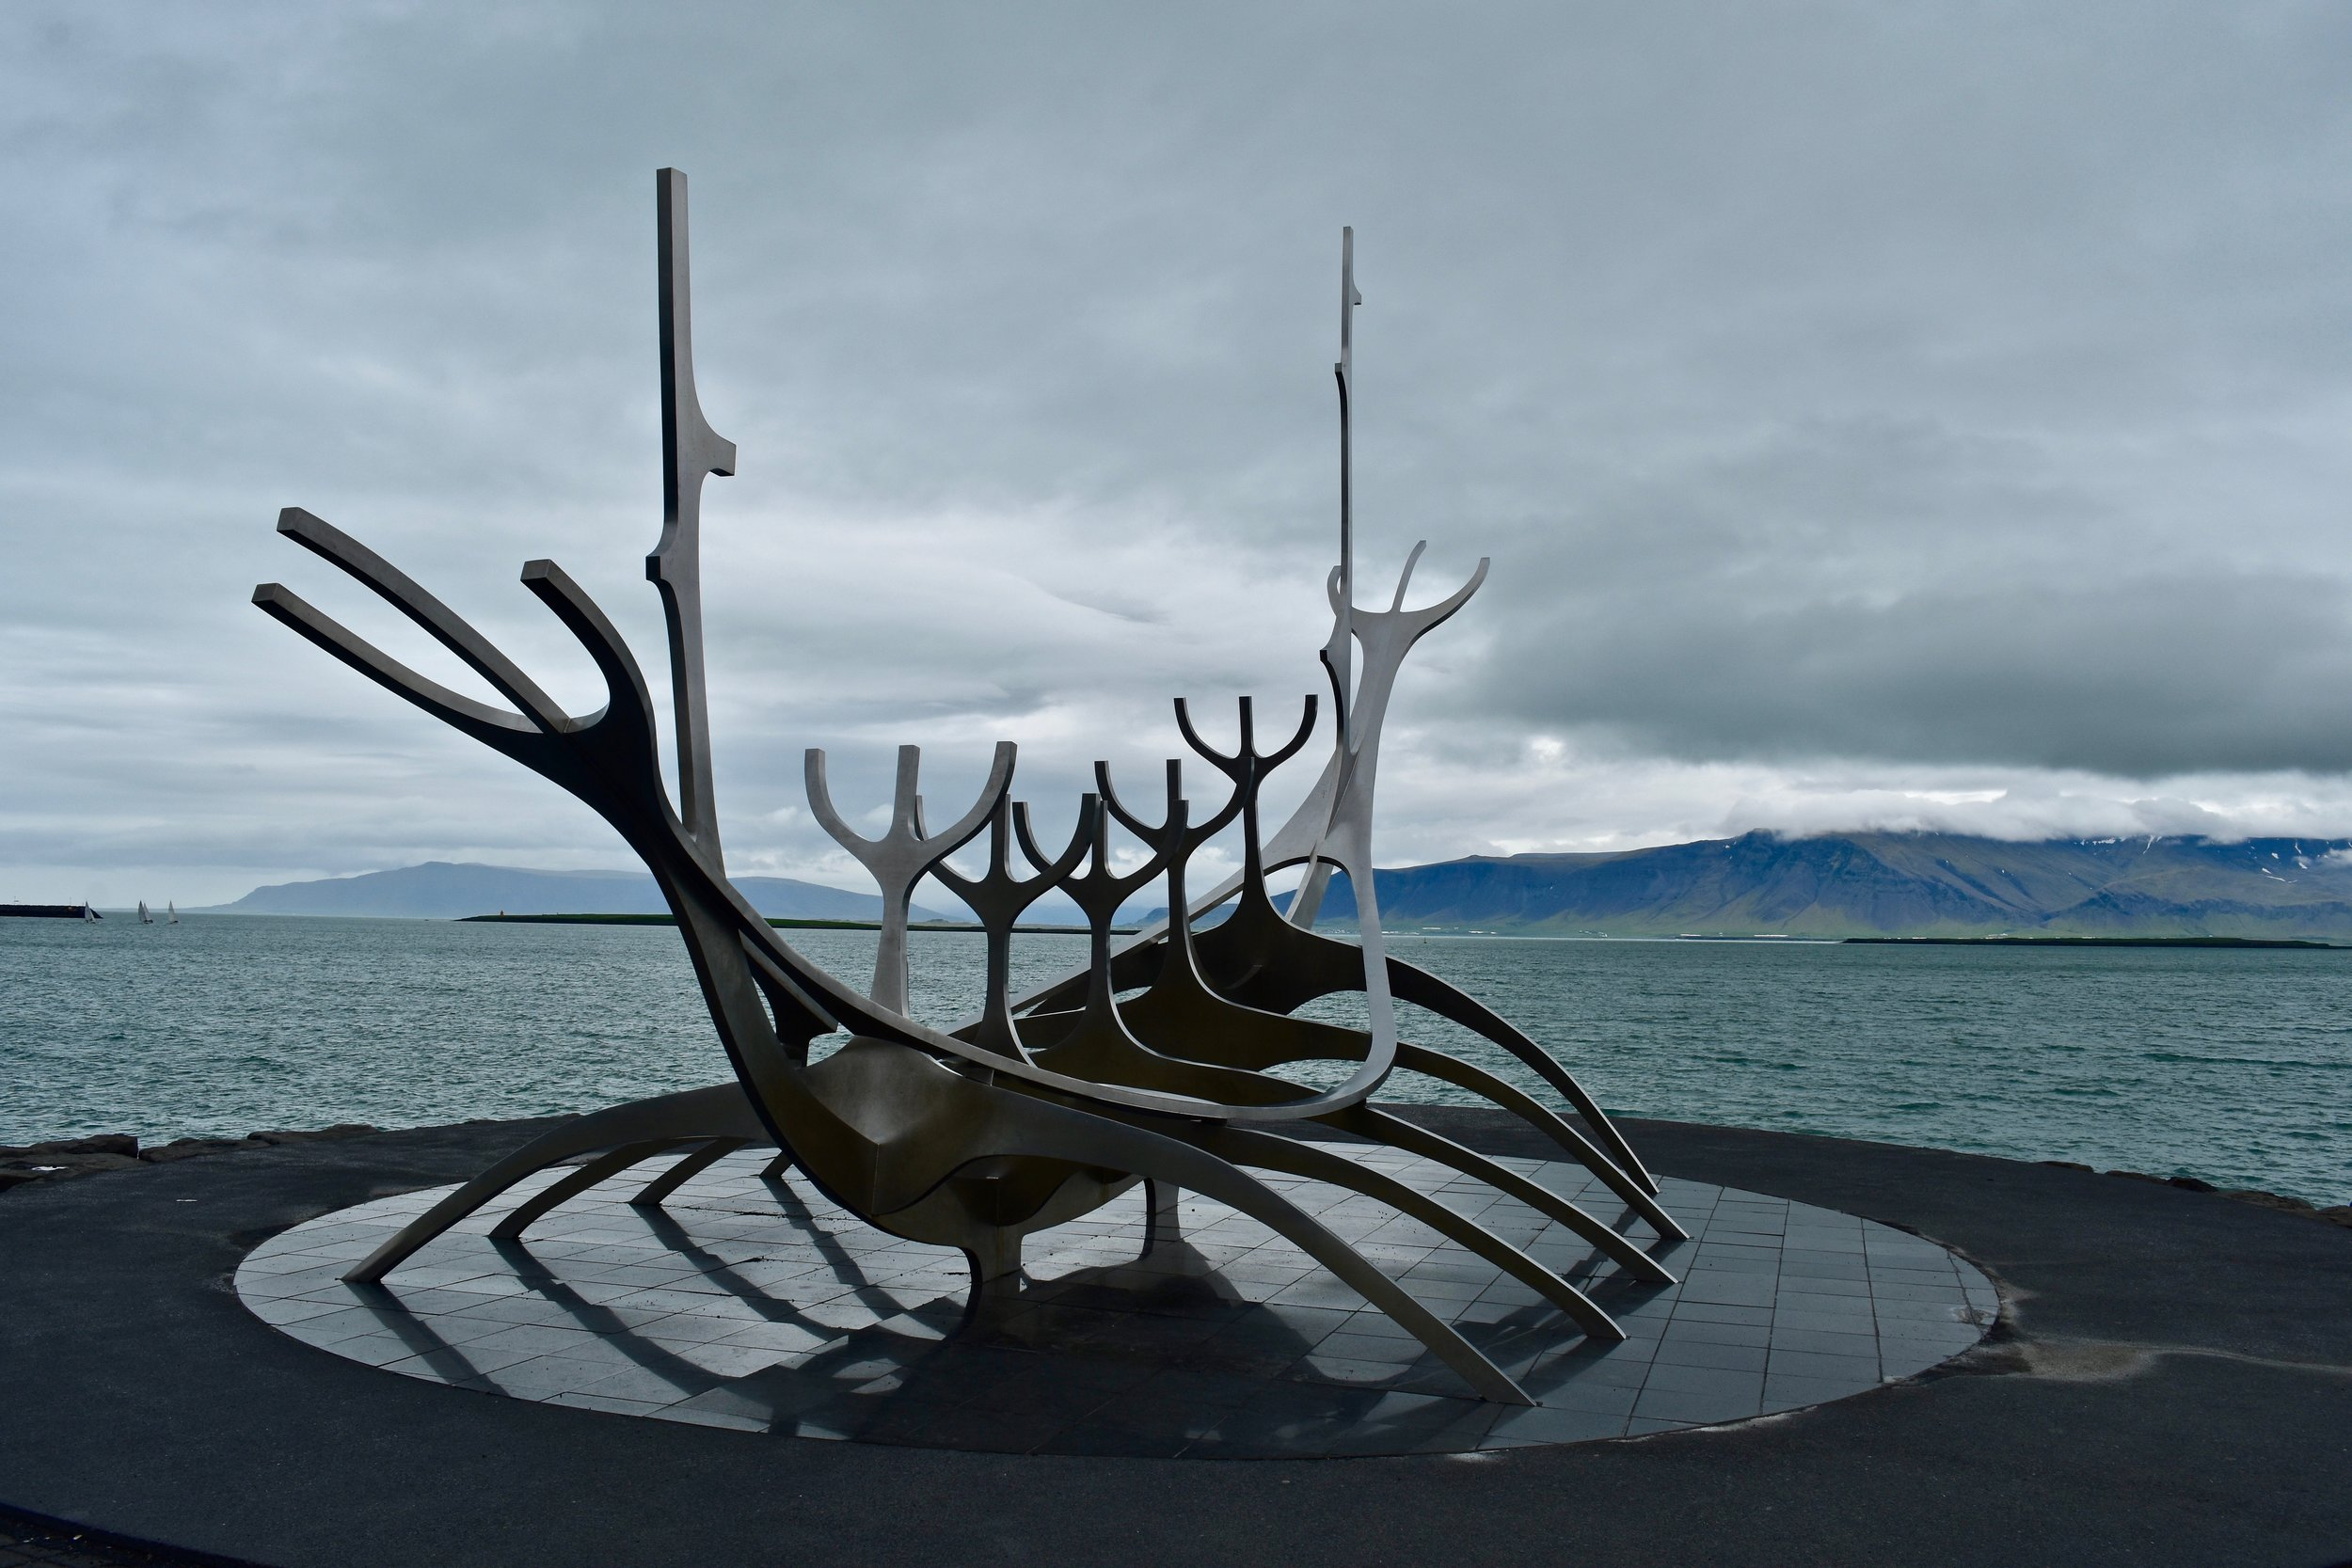 Sculpture and Shore Walk in Reykjavik, Iceland